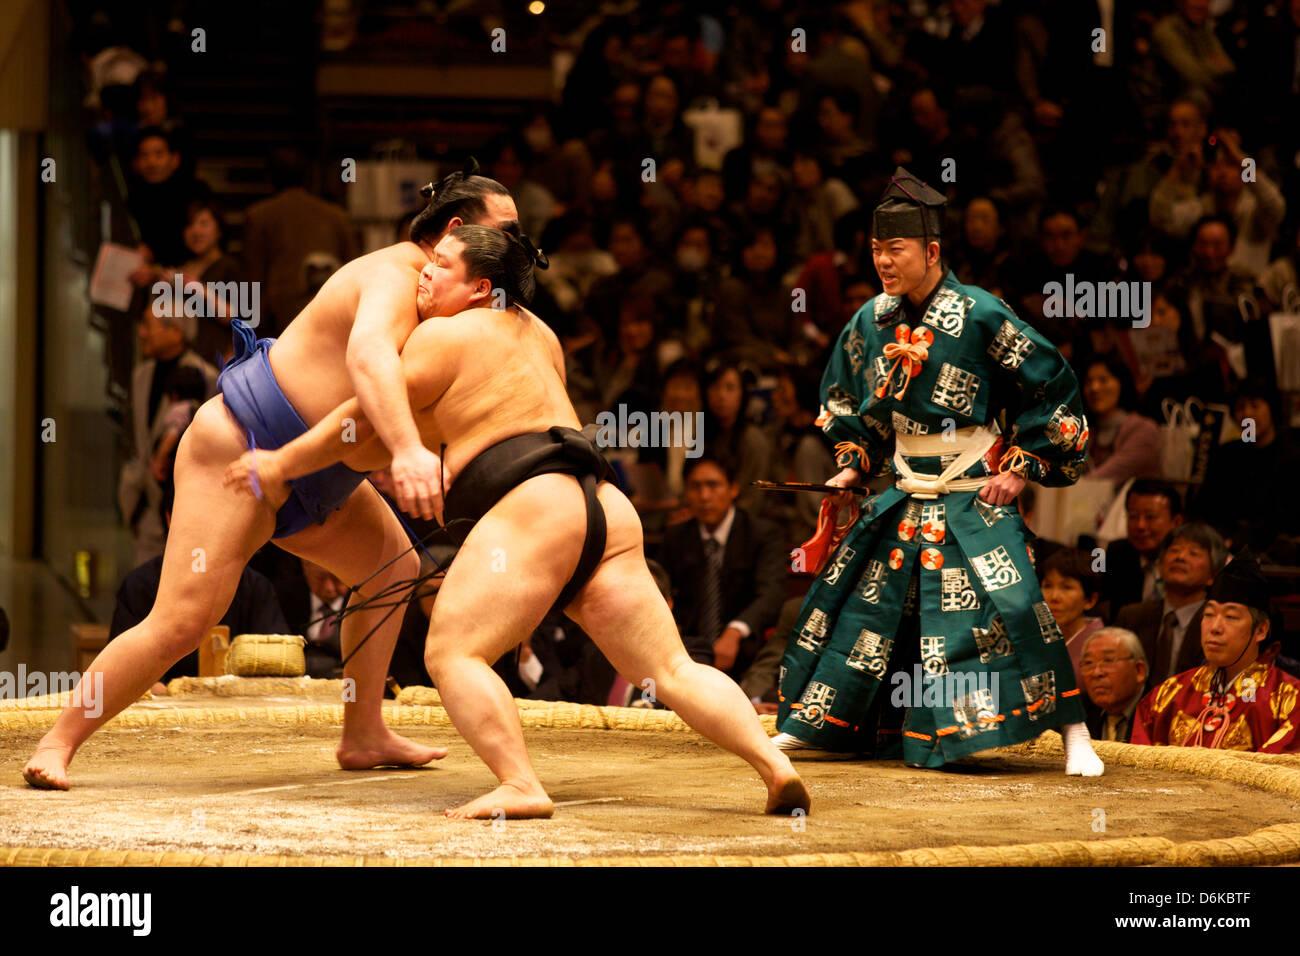 Due lottatori di sumo lotta al Kokugikan stadium, Tokyo, Giappone, Asia Immagini Stock